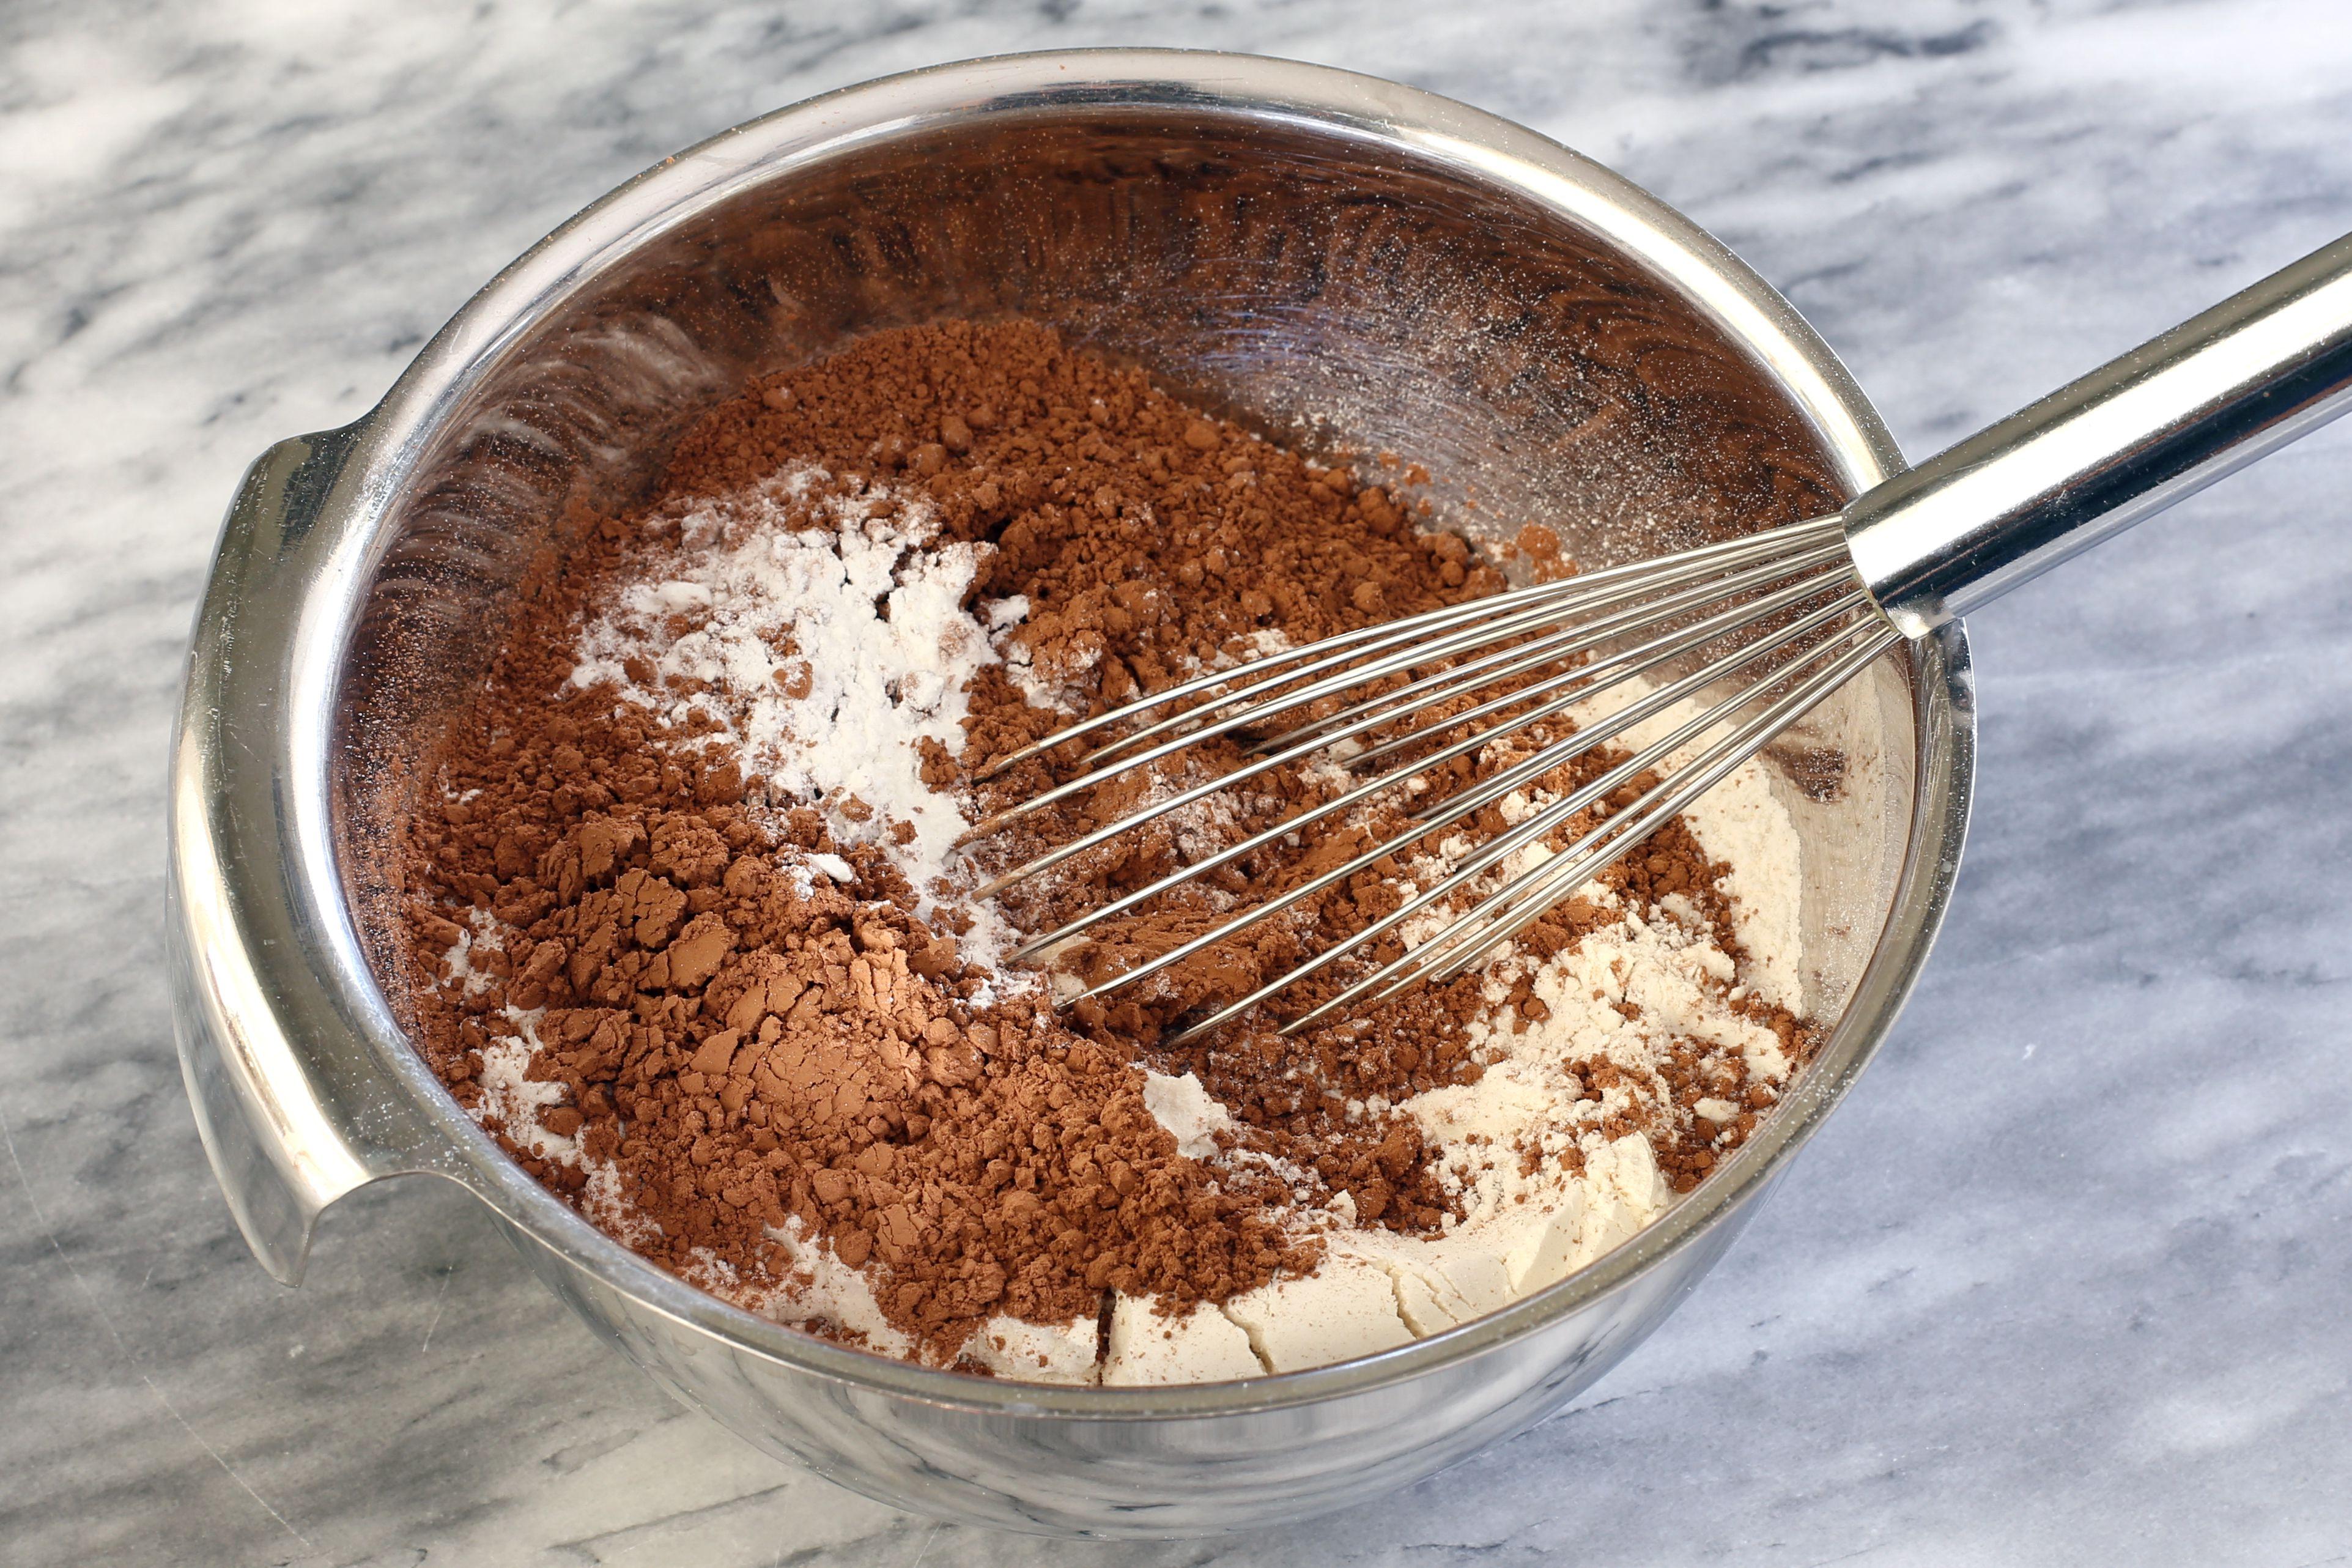 Combine the dry ingredients.